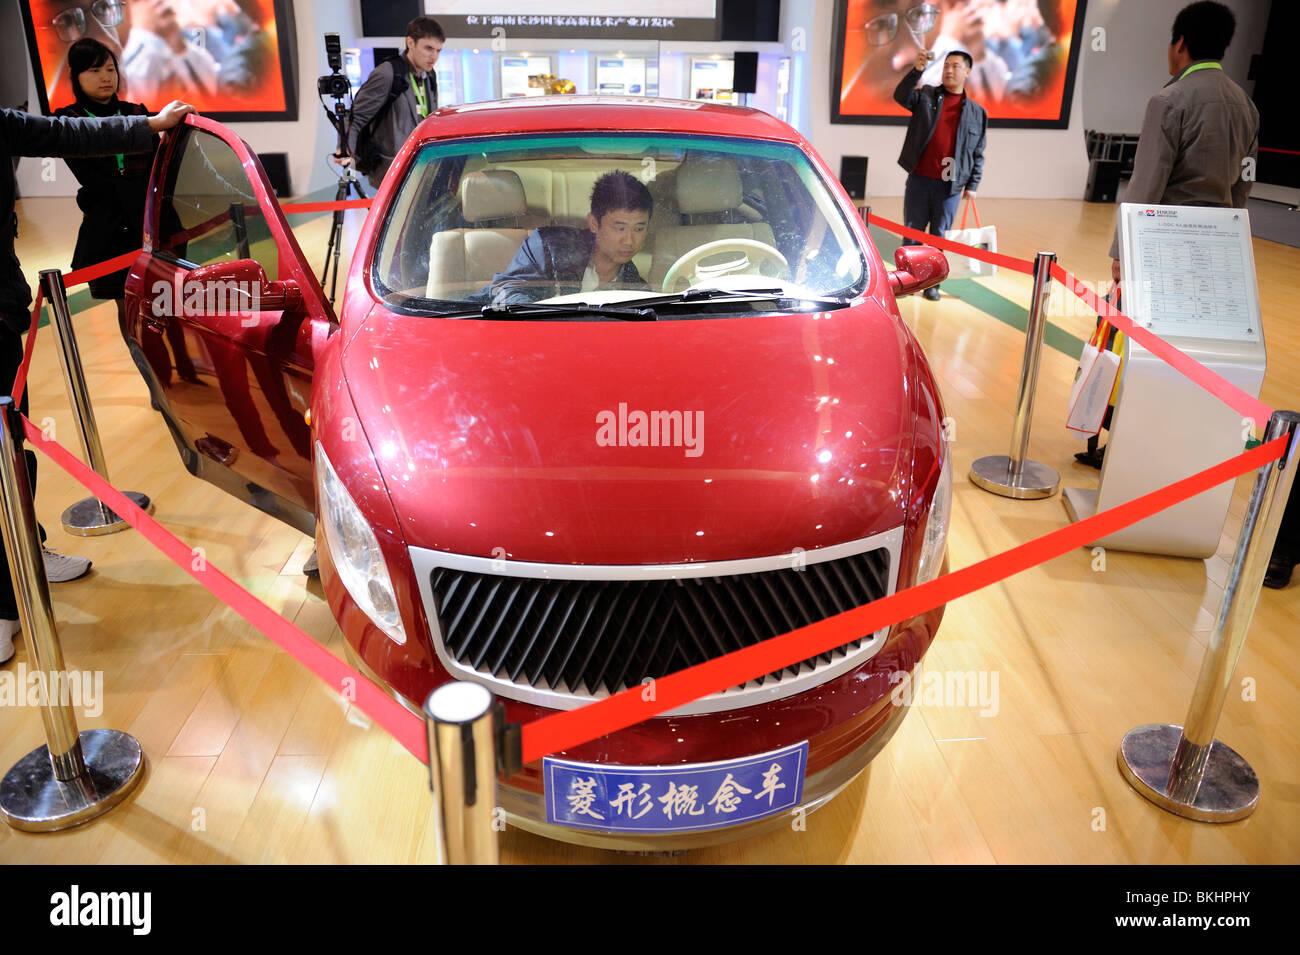 Konzeptfahrzeug von Hunan Normal University in Beijing Auto Show 2010. Stockbild